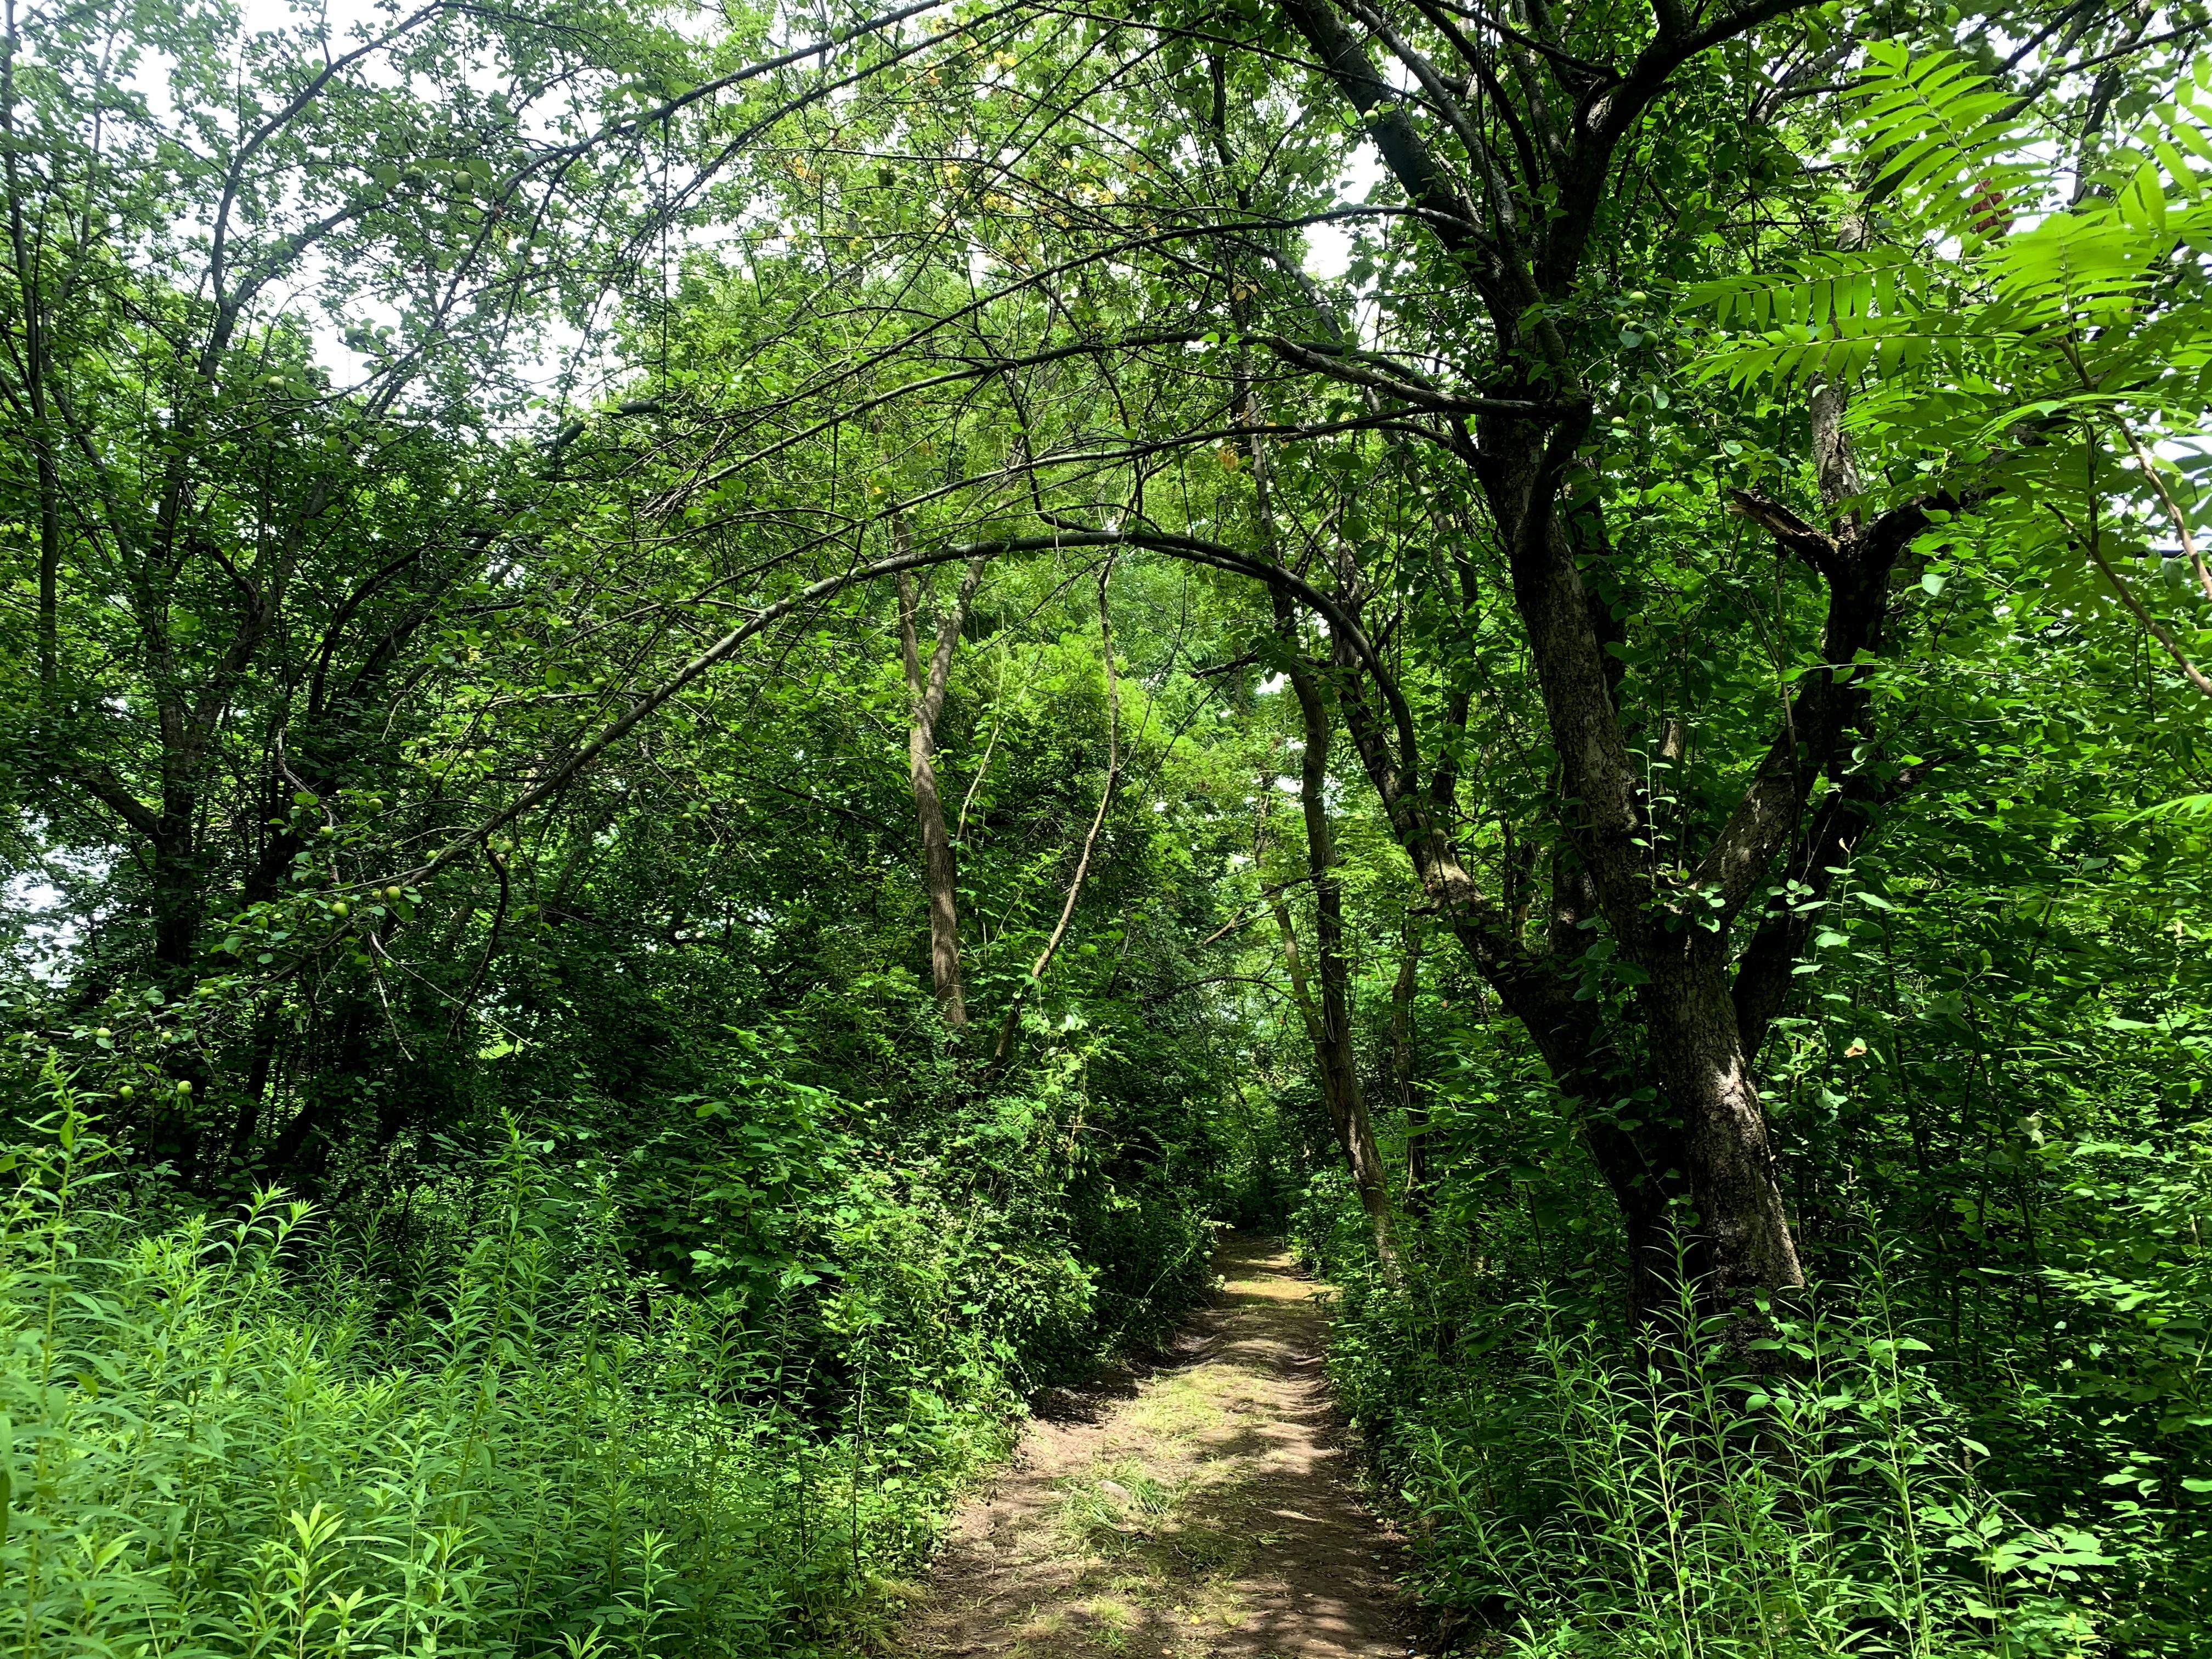 The Rotisken'rakéhte cleared brush to form a trail throughout the encampment. (Ka'nhehsí:io Deer/CBC)